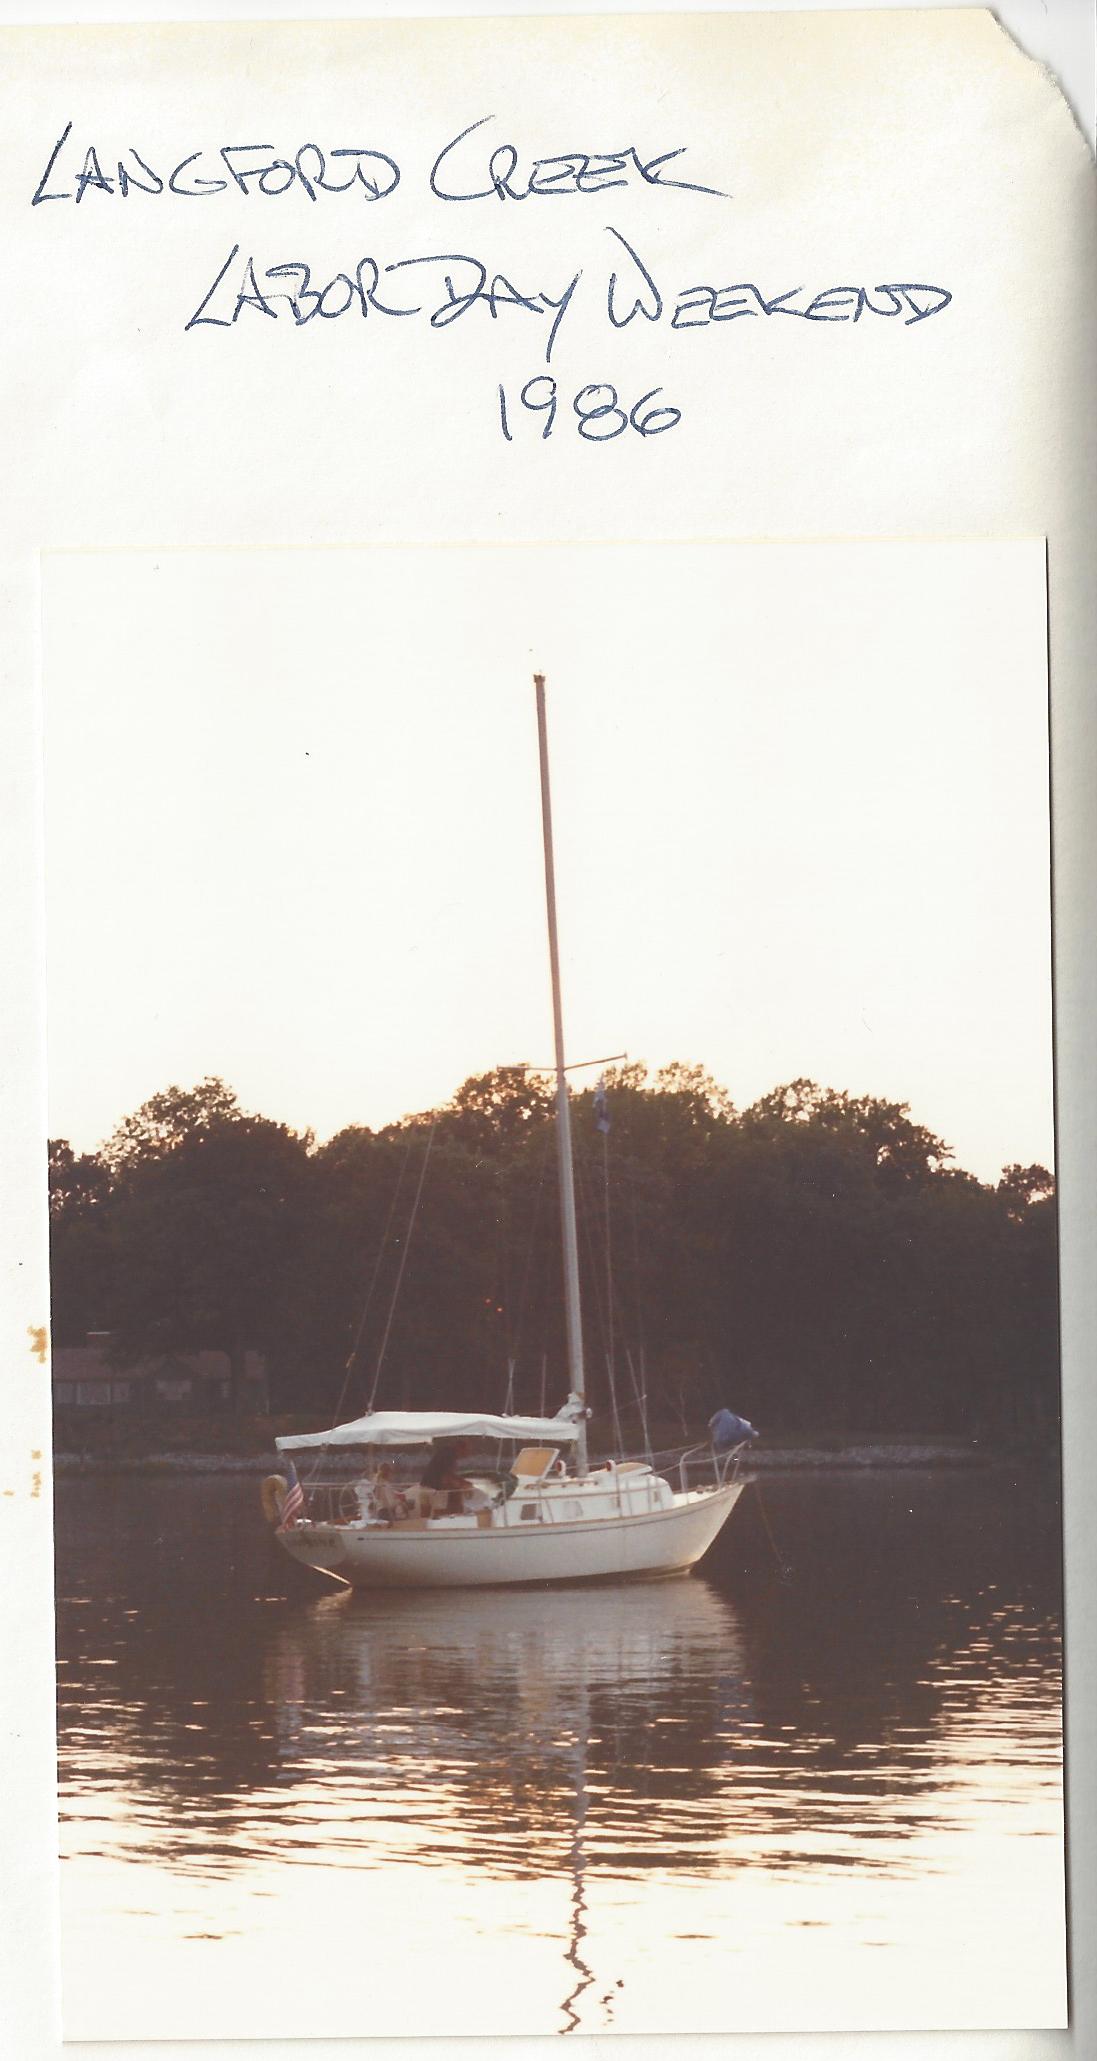 CBC Lankford Creek 1986_Daphne